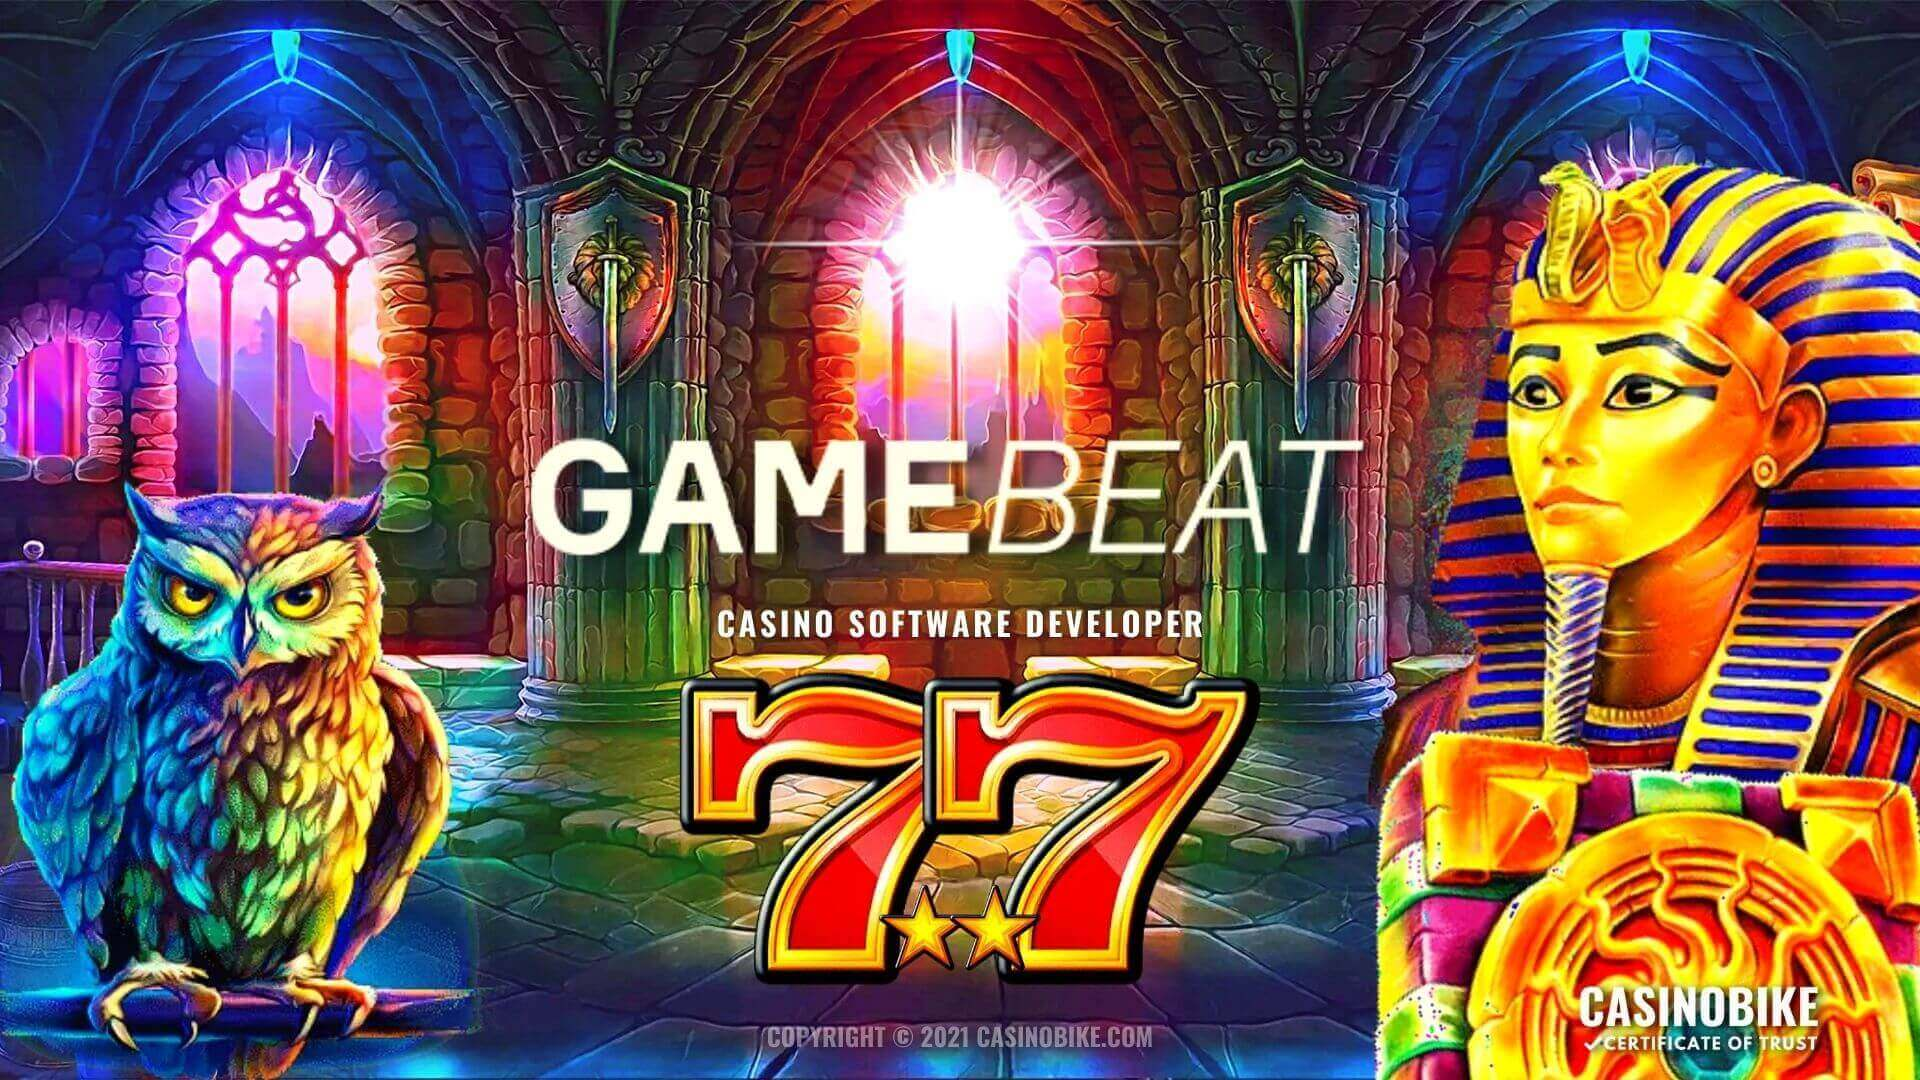 GameBeat Gaming Online Casino Software Developer